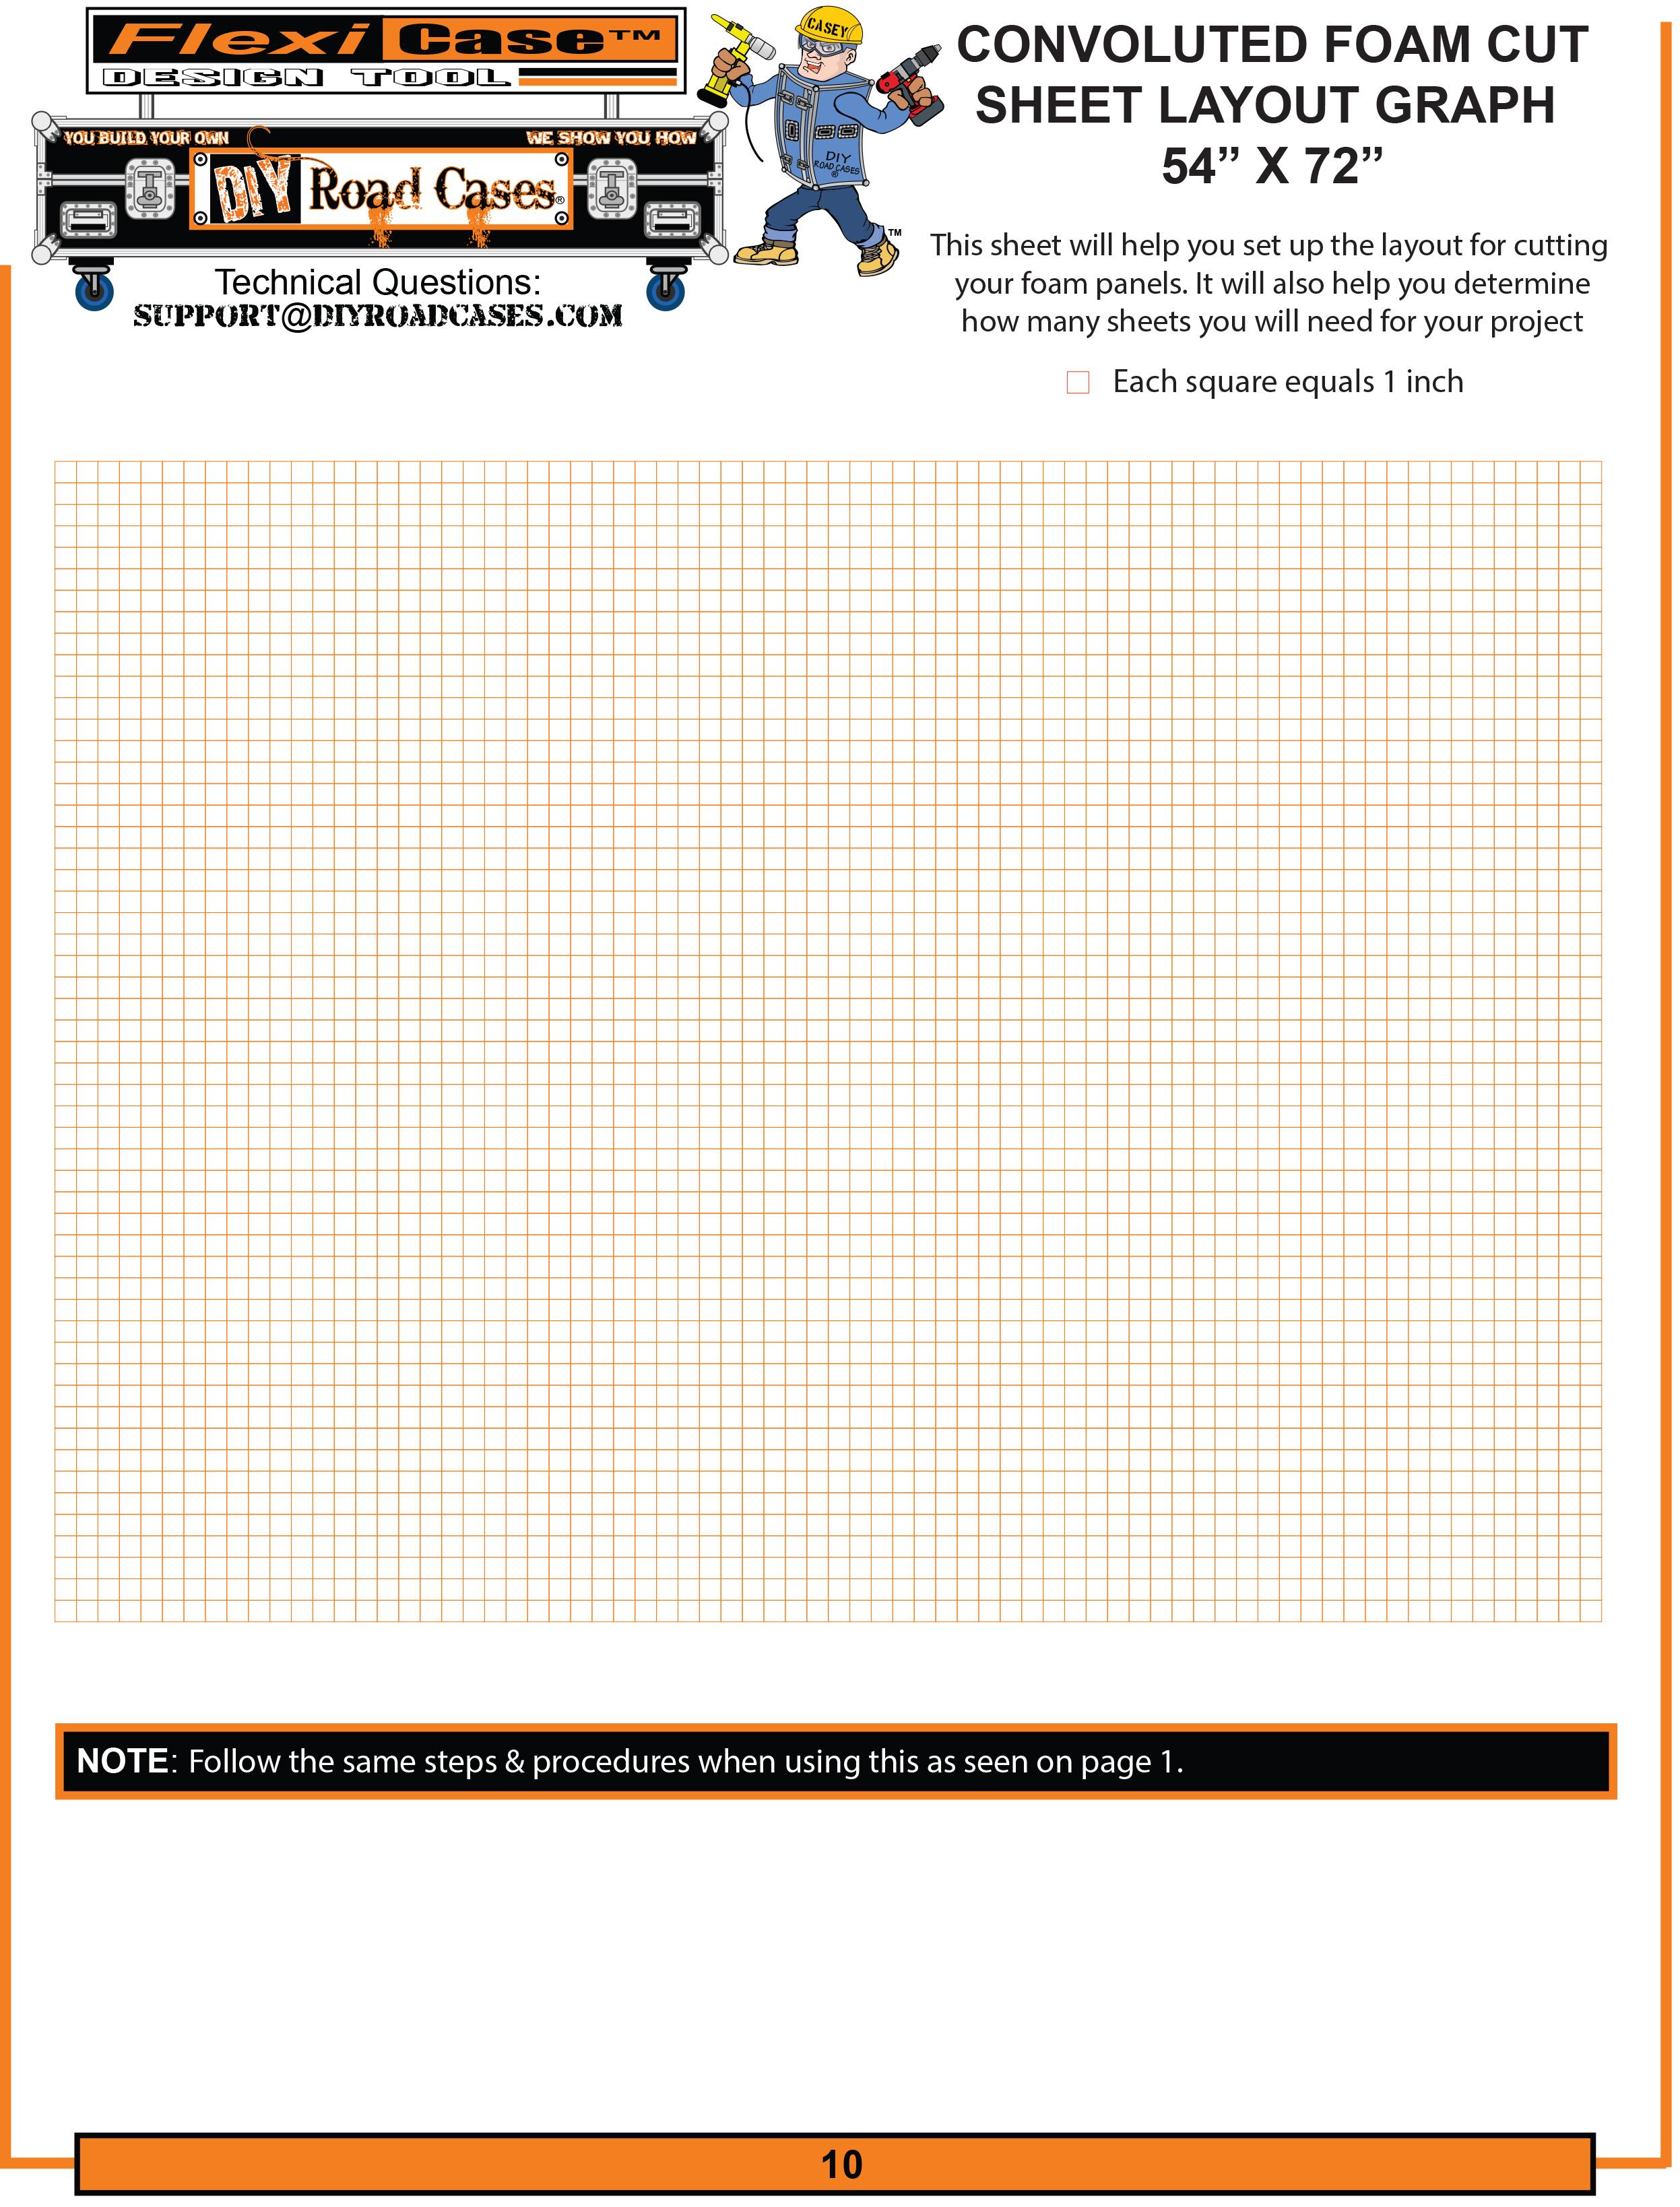 convoluted-foam-cut-sheet-layout-graph.jpg